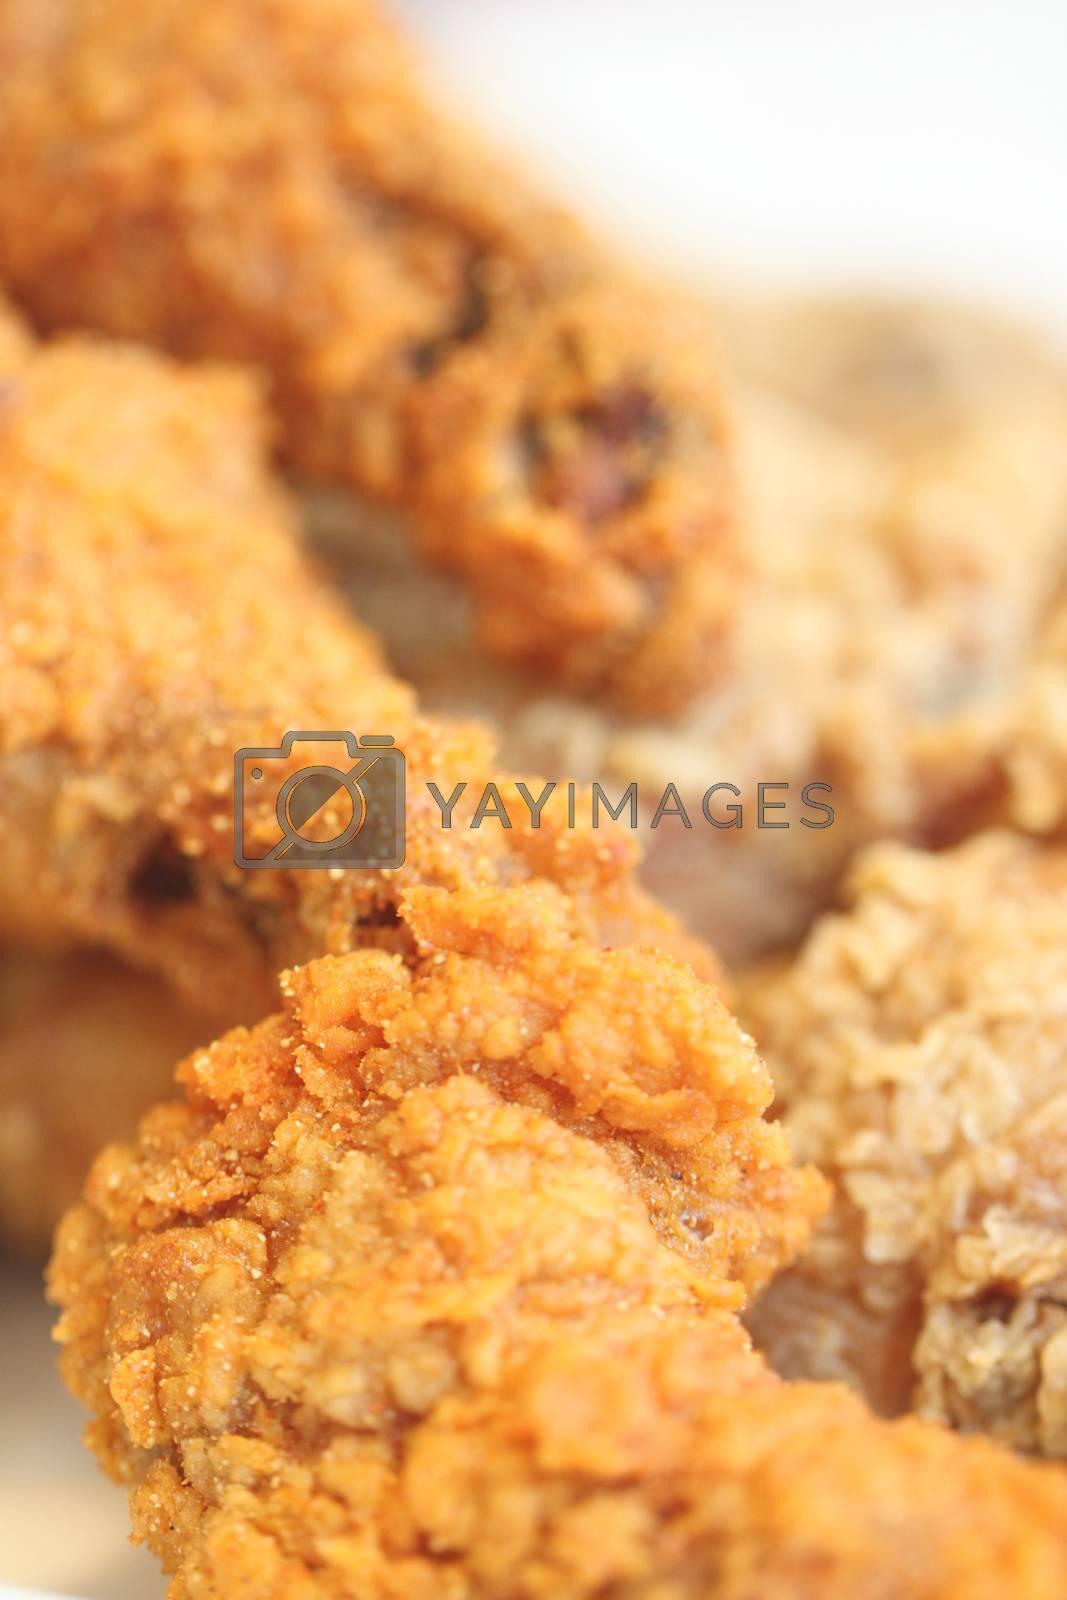 Fried chicken on a dish. by PiyaPhoto